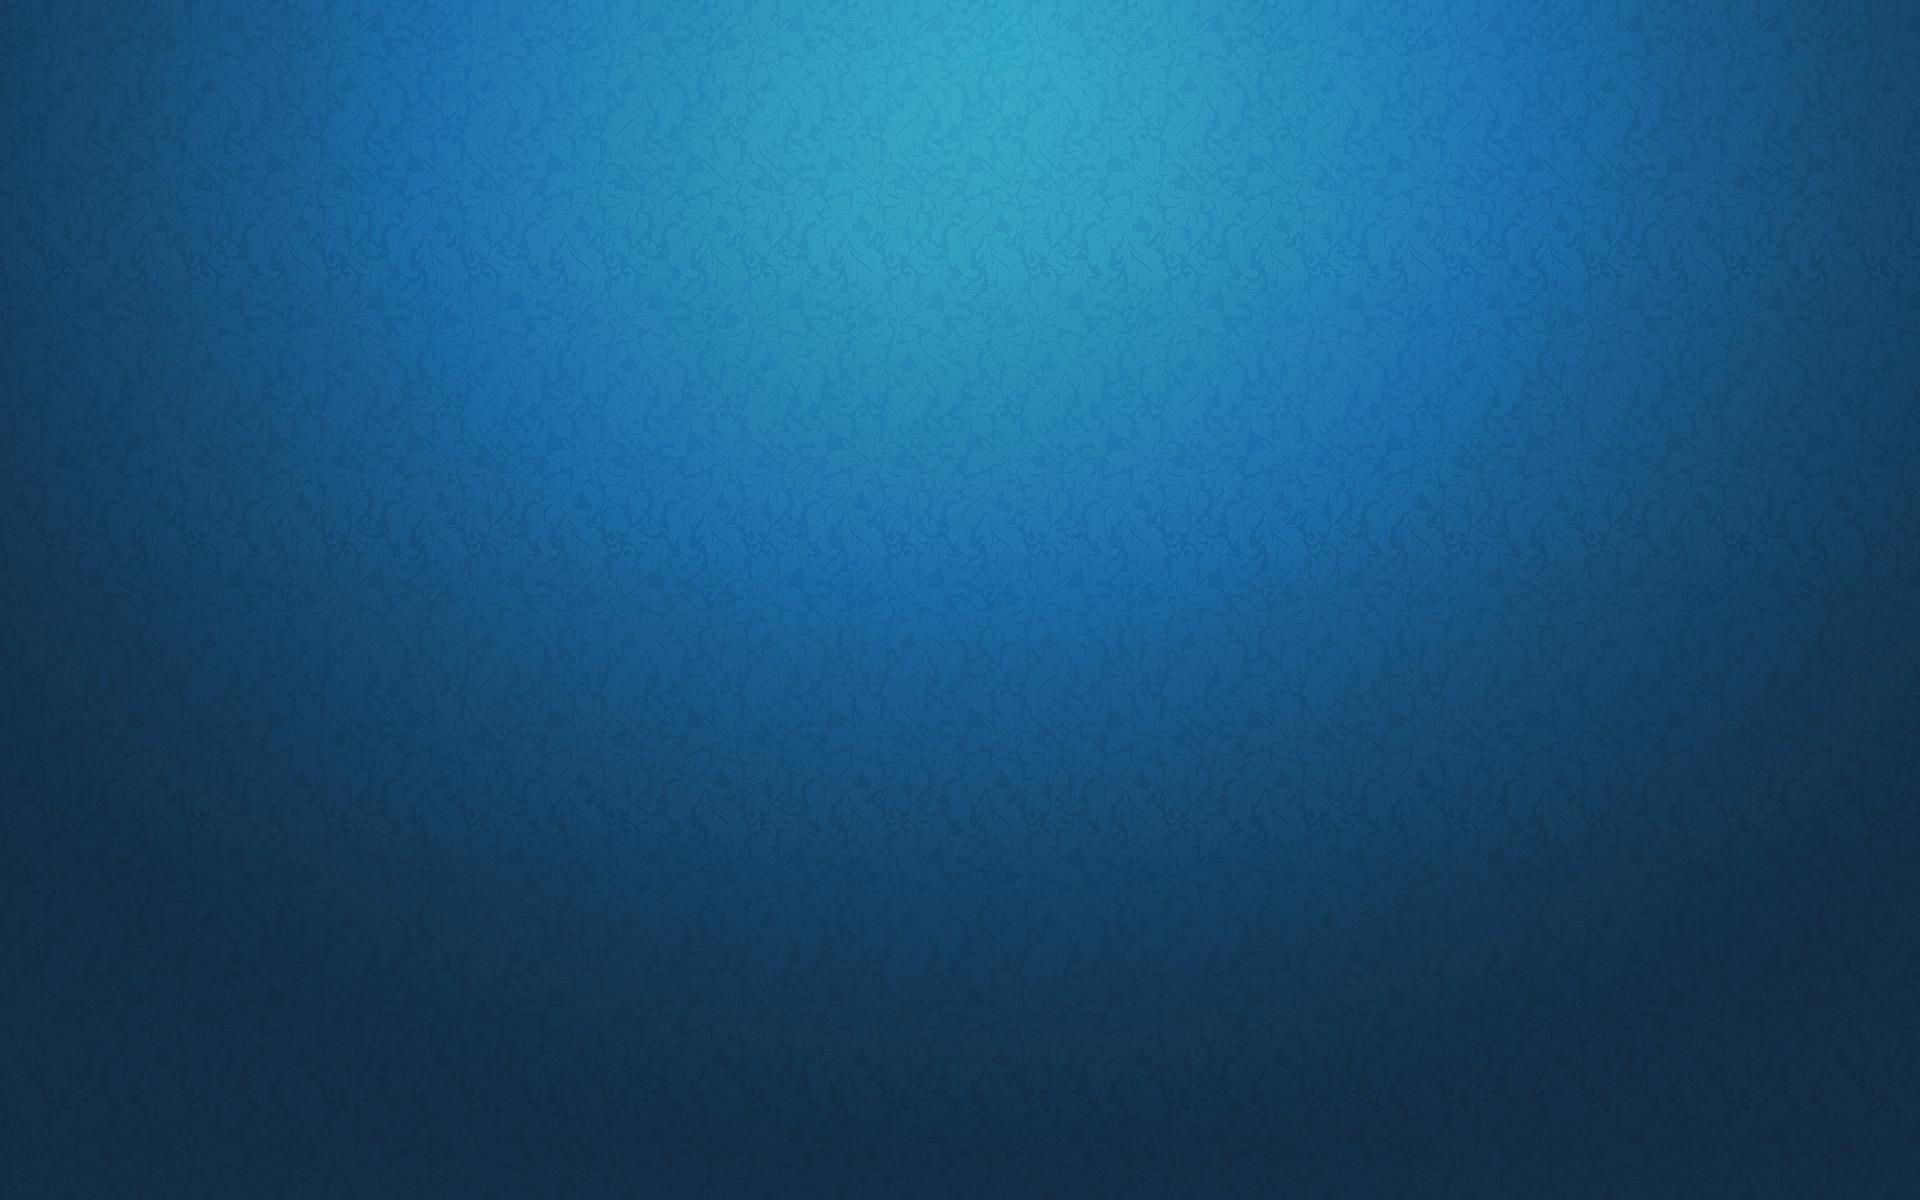 Free Photo Blue Design Blue Design Texture Free